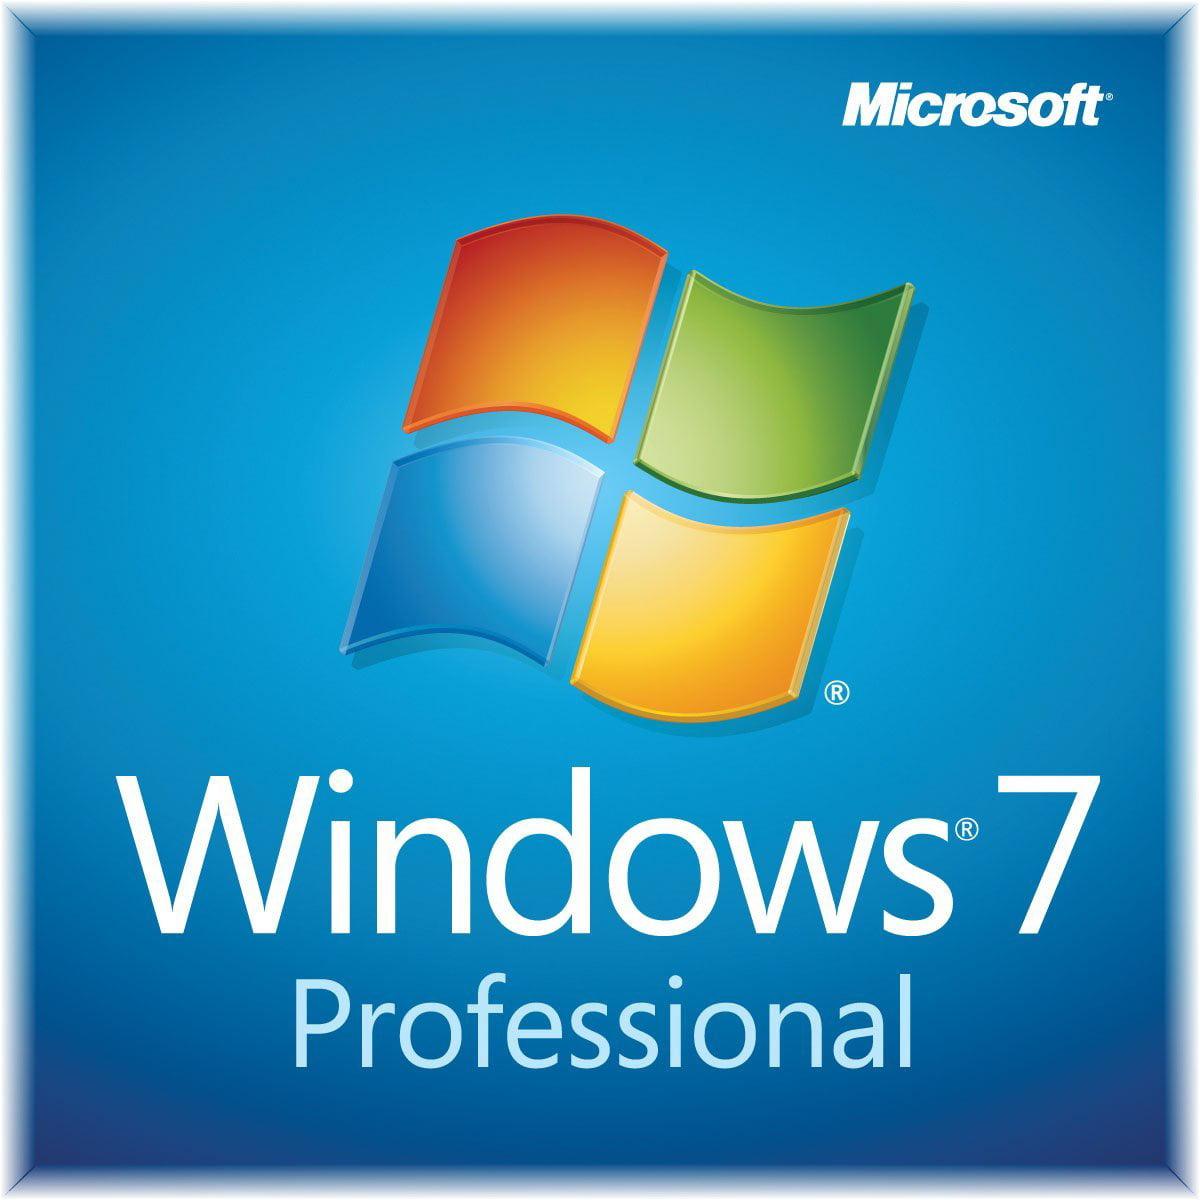 Microsoft windows 7 professional 32/64 bit ( dvd ) buy microsoft.